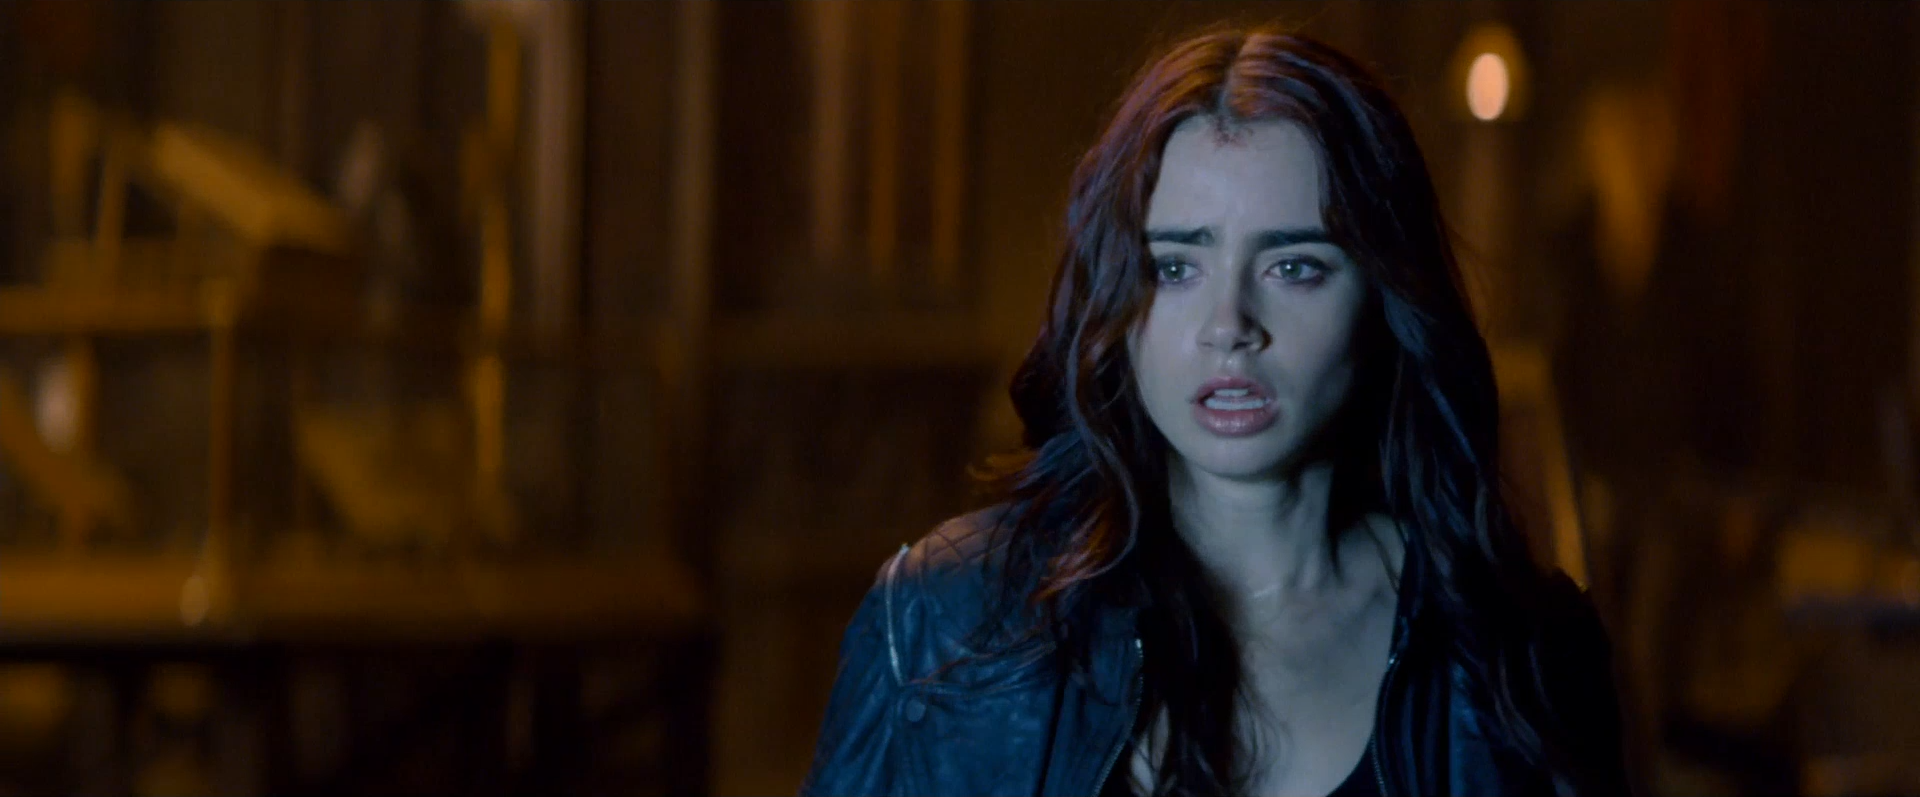 The Mortal Instruments City of Bones - trailer.png